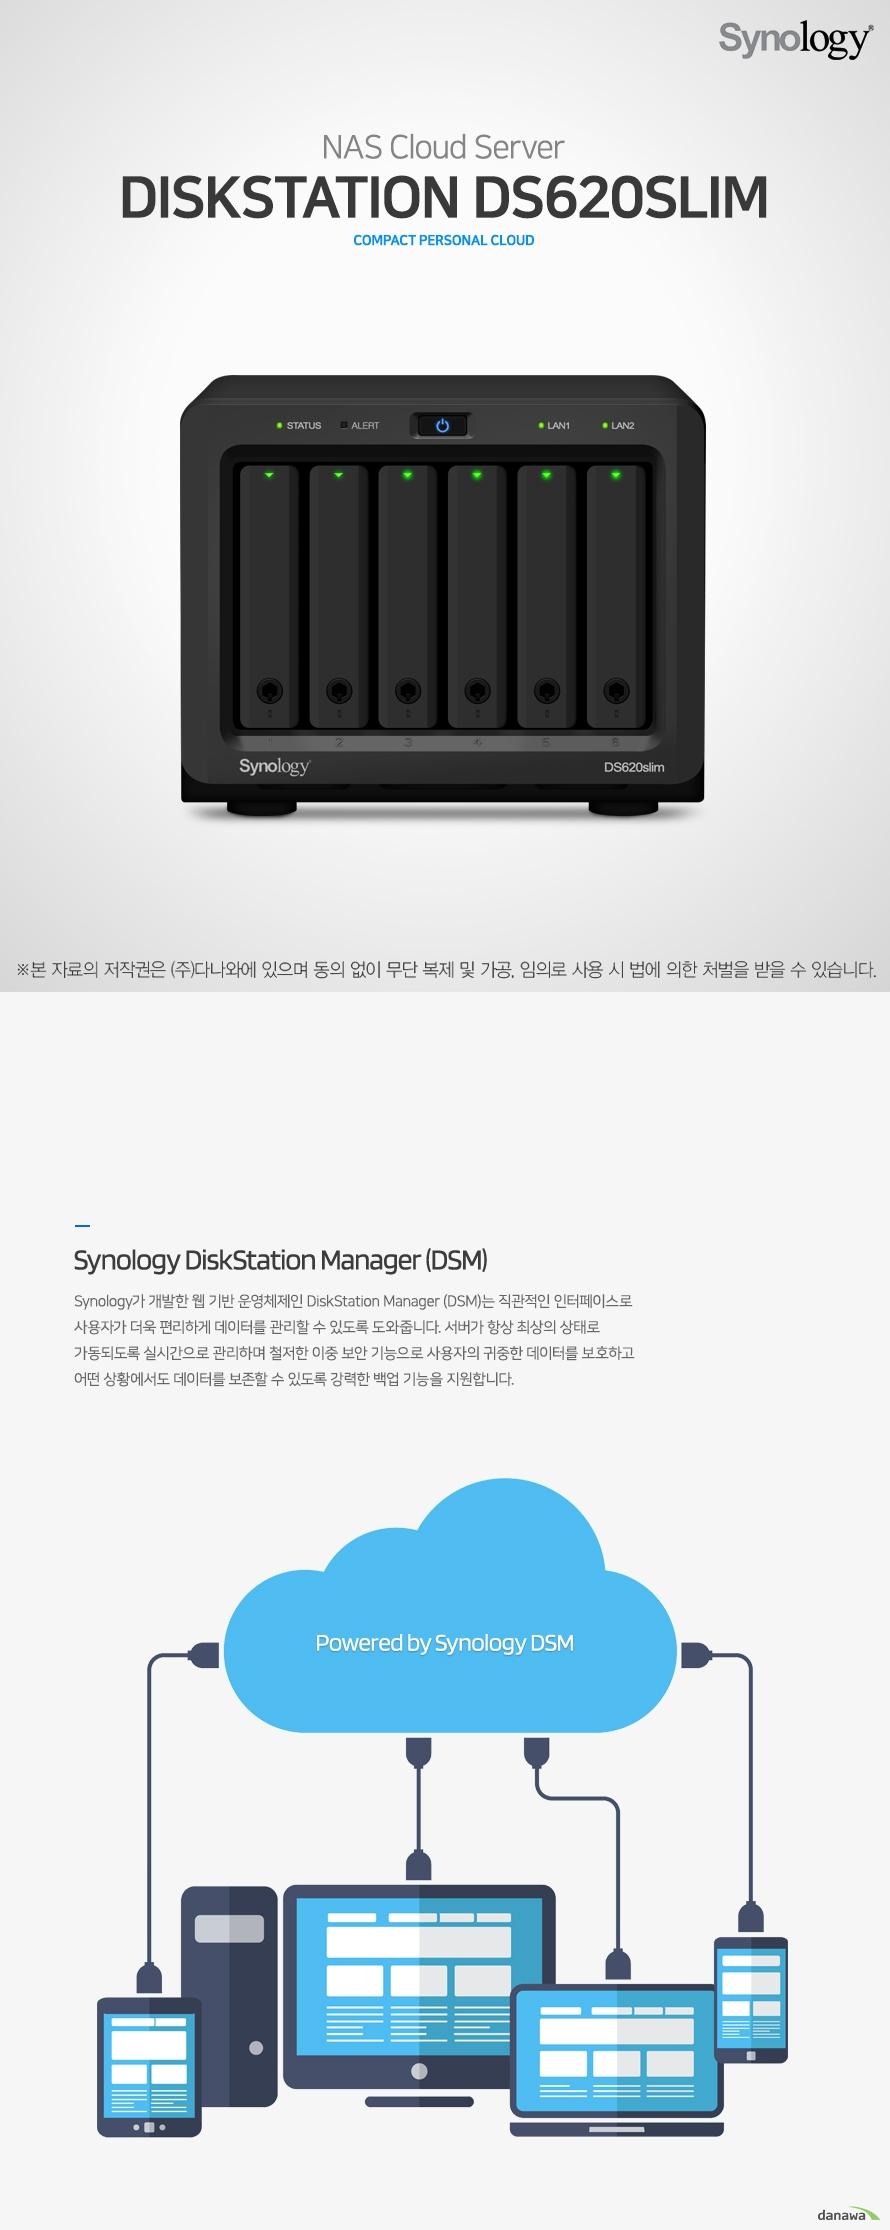 NAS Cloud Server DiskStation DS620slim compact personal cloud Synology DiskStation Manager (DSM) Synology가 개발한 웹 기반 운영체제인 DiskStation Manager (DSM)는 직관적인 인터페이스로 사용자가 더욱 편리하게 데이터를 관리할 수 있도록 도와줍니다. 서버가 항상 최상의 상태로 가동되도록 실시간으로 관리하며 철저한 이중 보안 기능으로 사용자의 귀중한 데이터를 보호하고 어떤 상황에서도 데이터를 보존할 수 있도록 강력한 백업 기능을 지원합니다. Powered by Synology DSM Versatile in feature 이동 중에서도 파일에 액세스하고 안전한 파일 전송 공유 기능을 제공하는 큐브형 NAS 제품입니다. 스마트하고 안정적인 파트너로, 모든 사진, 비디오 및 파일을 체계적으로 정리합니다. CPU 인텔 Celeron J3355 2.0GHz 듀얼코어 / Memory DDR3L 2GB / Network 1Gbps 기가비트 이더넷 / Scalability 2.5